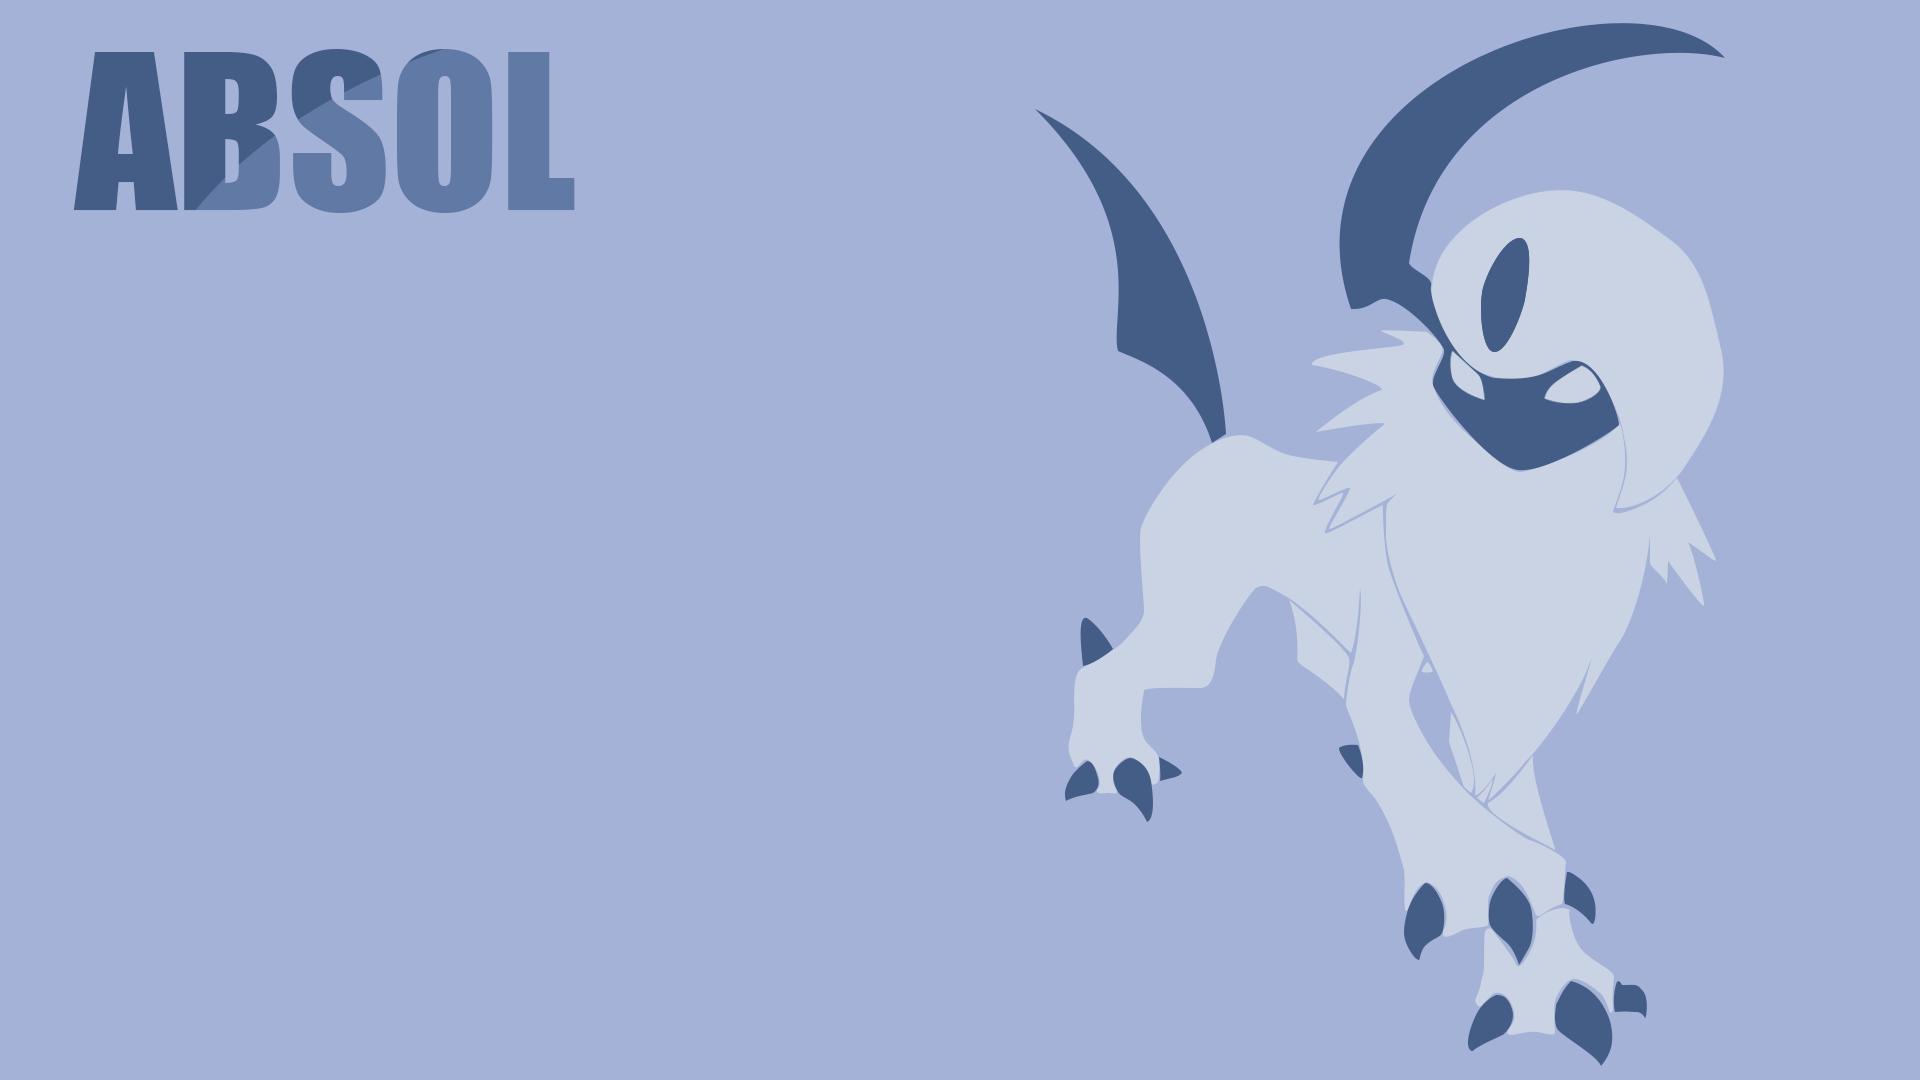 HD Absol Background 1920x1080